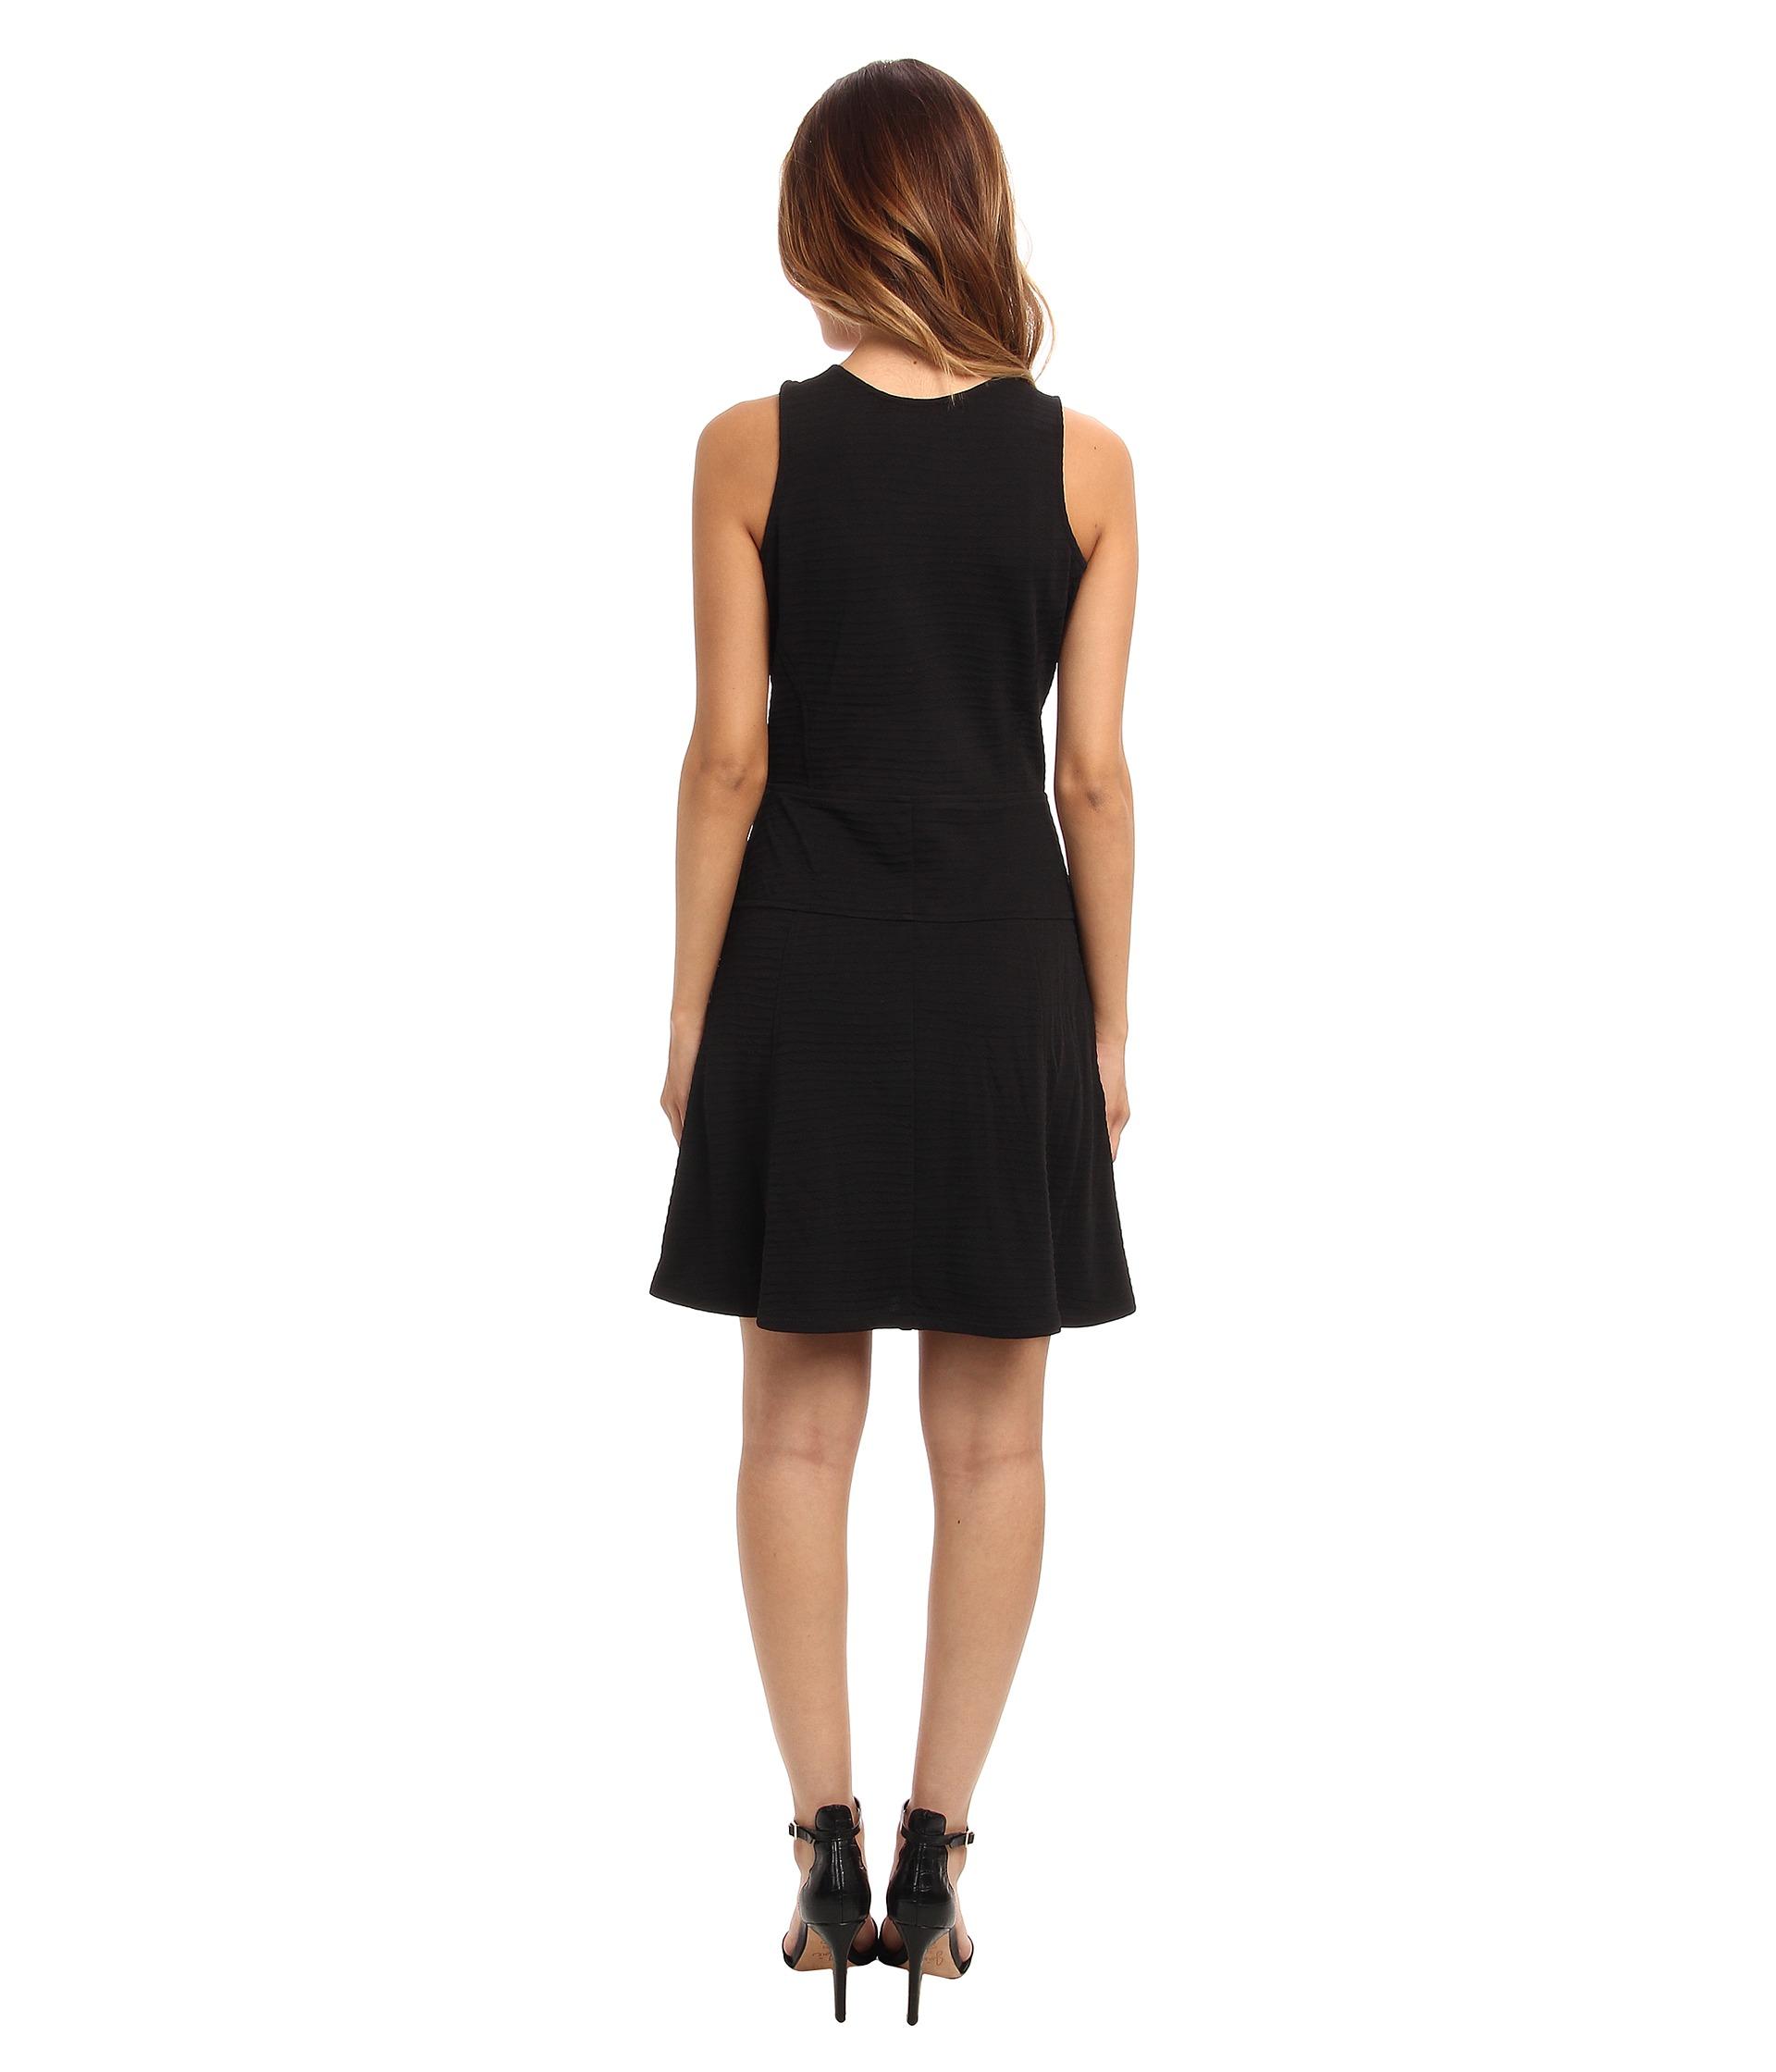 Sanctuary Zip Flirt Dress